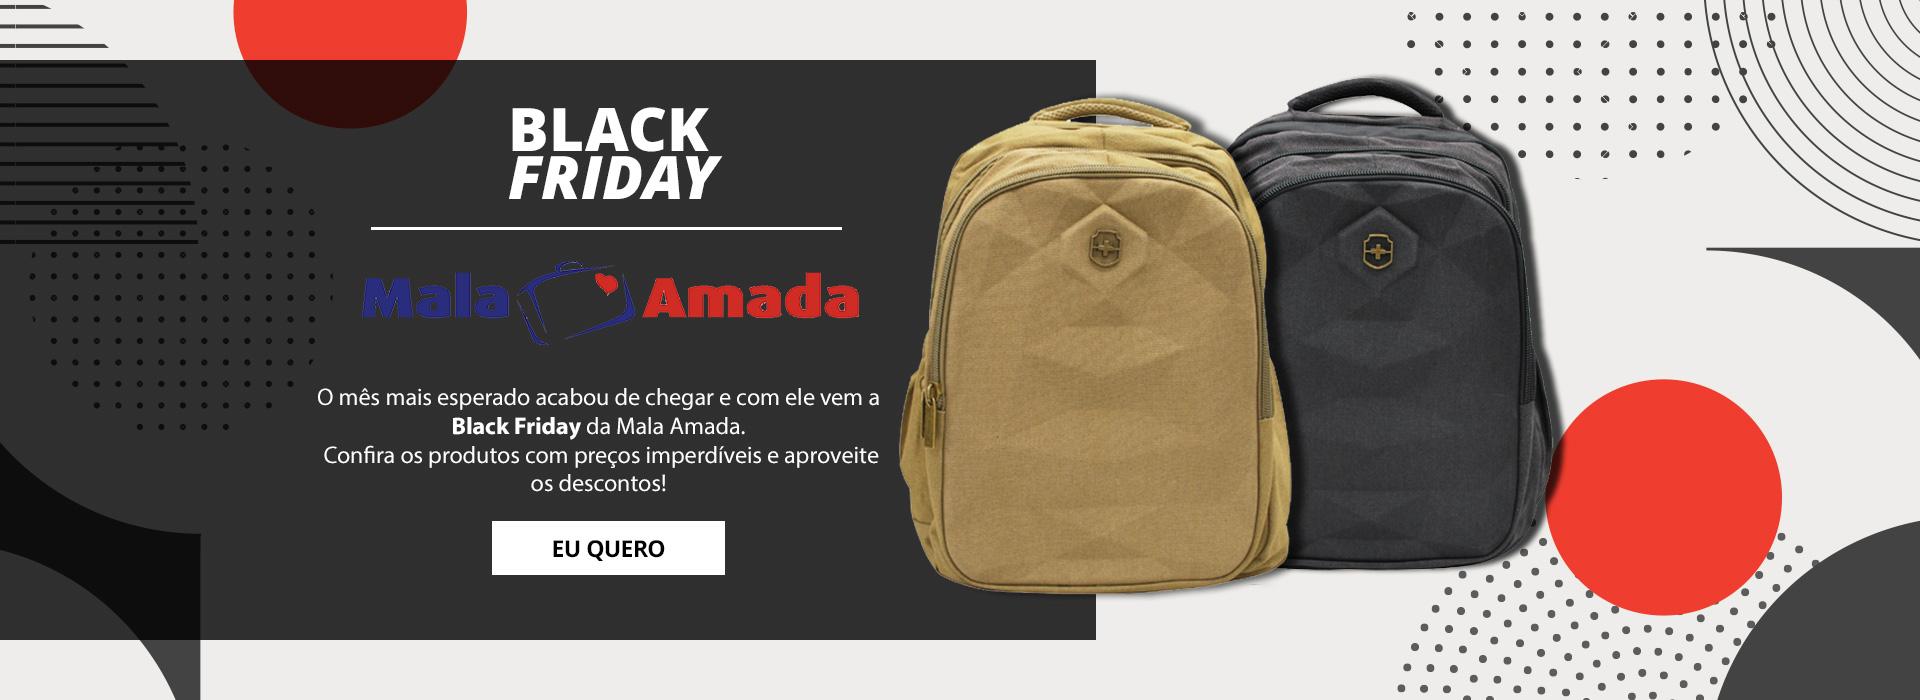 Banner 4 - Black Friday Mala Amada